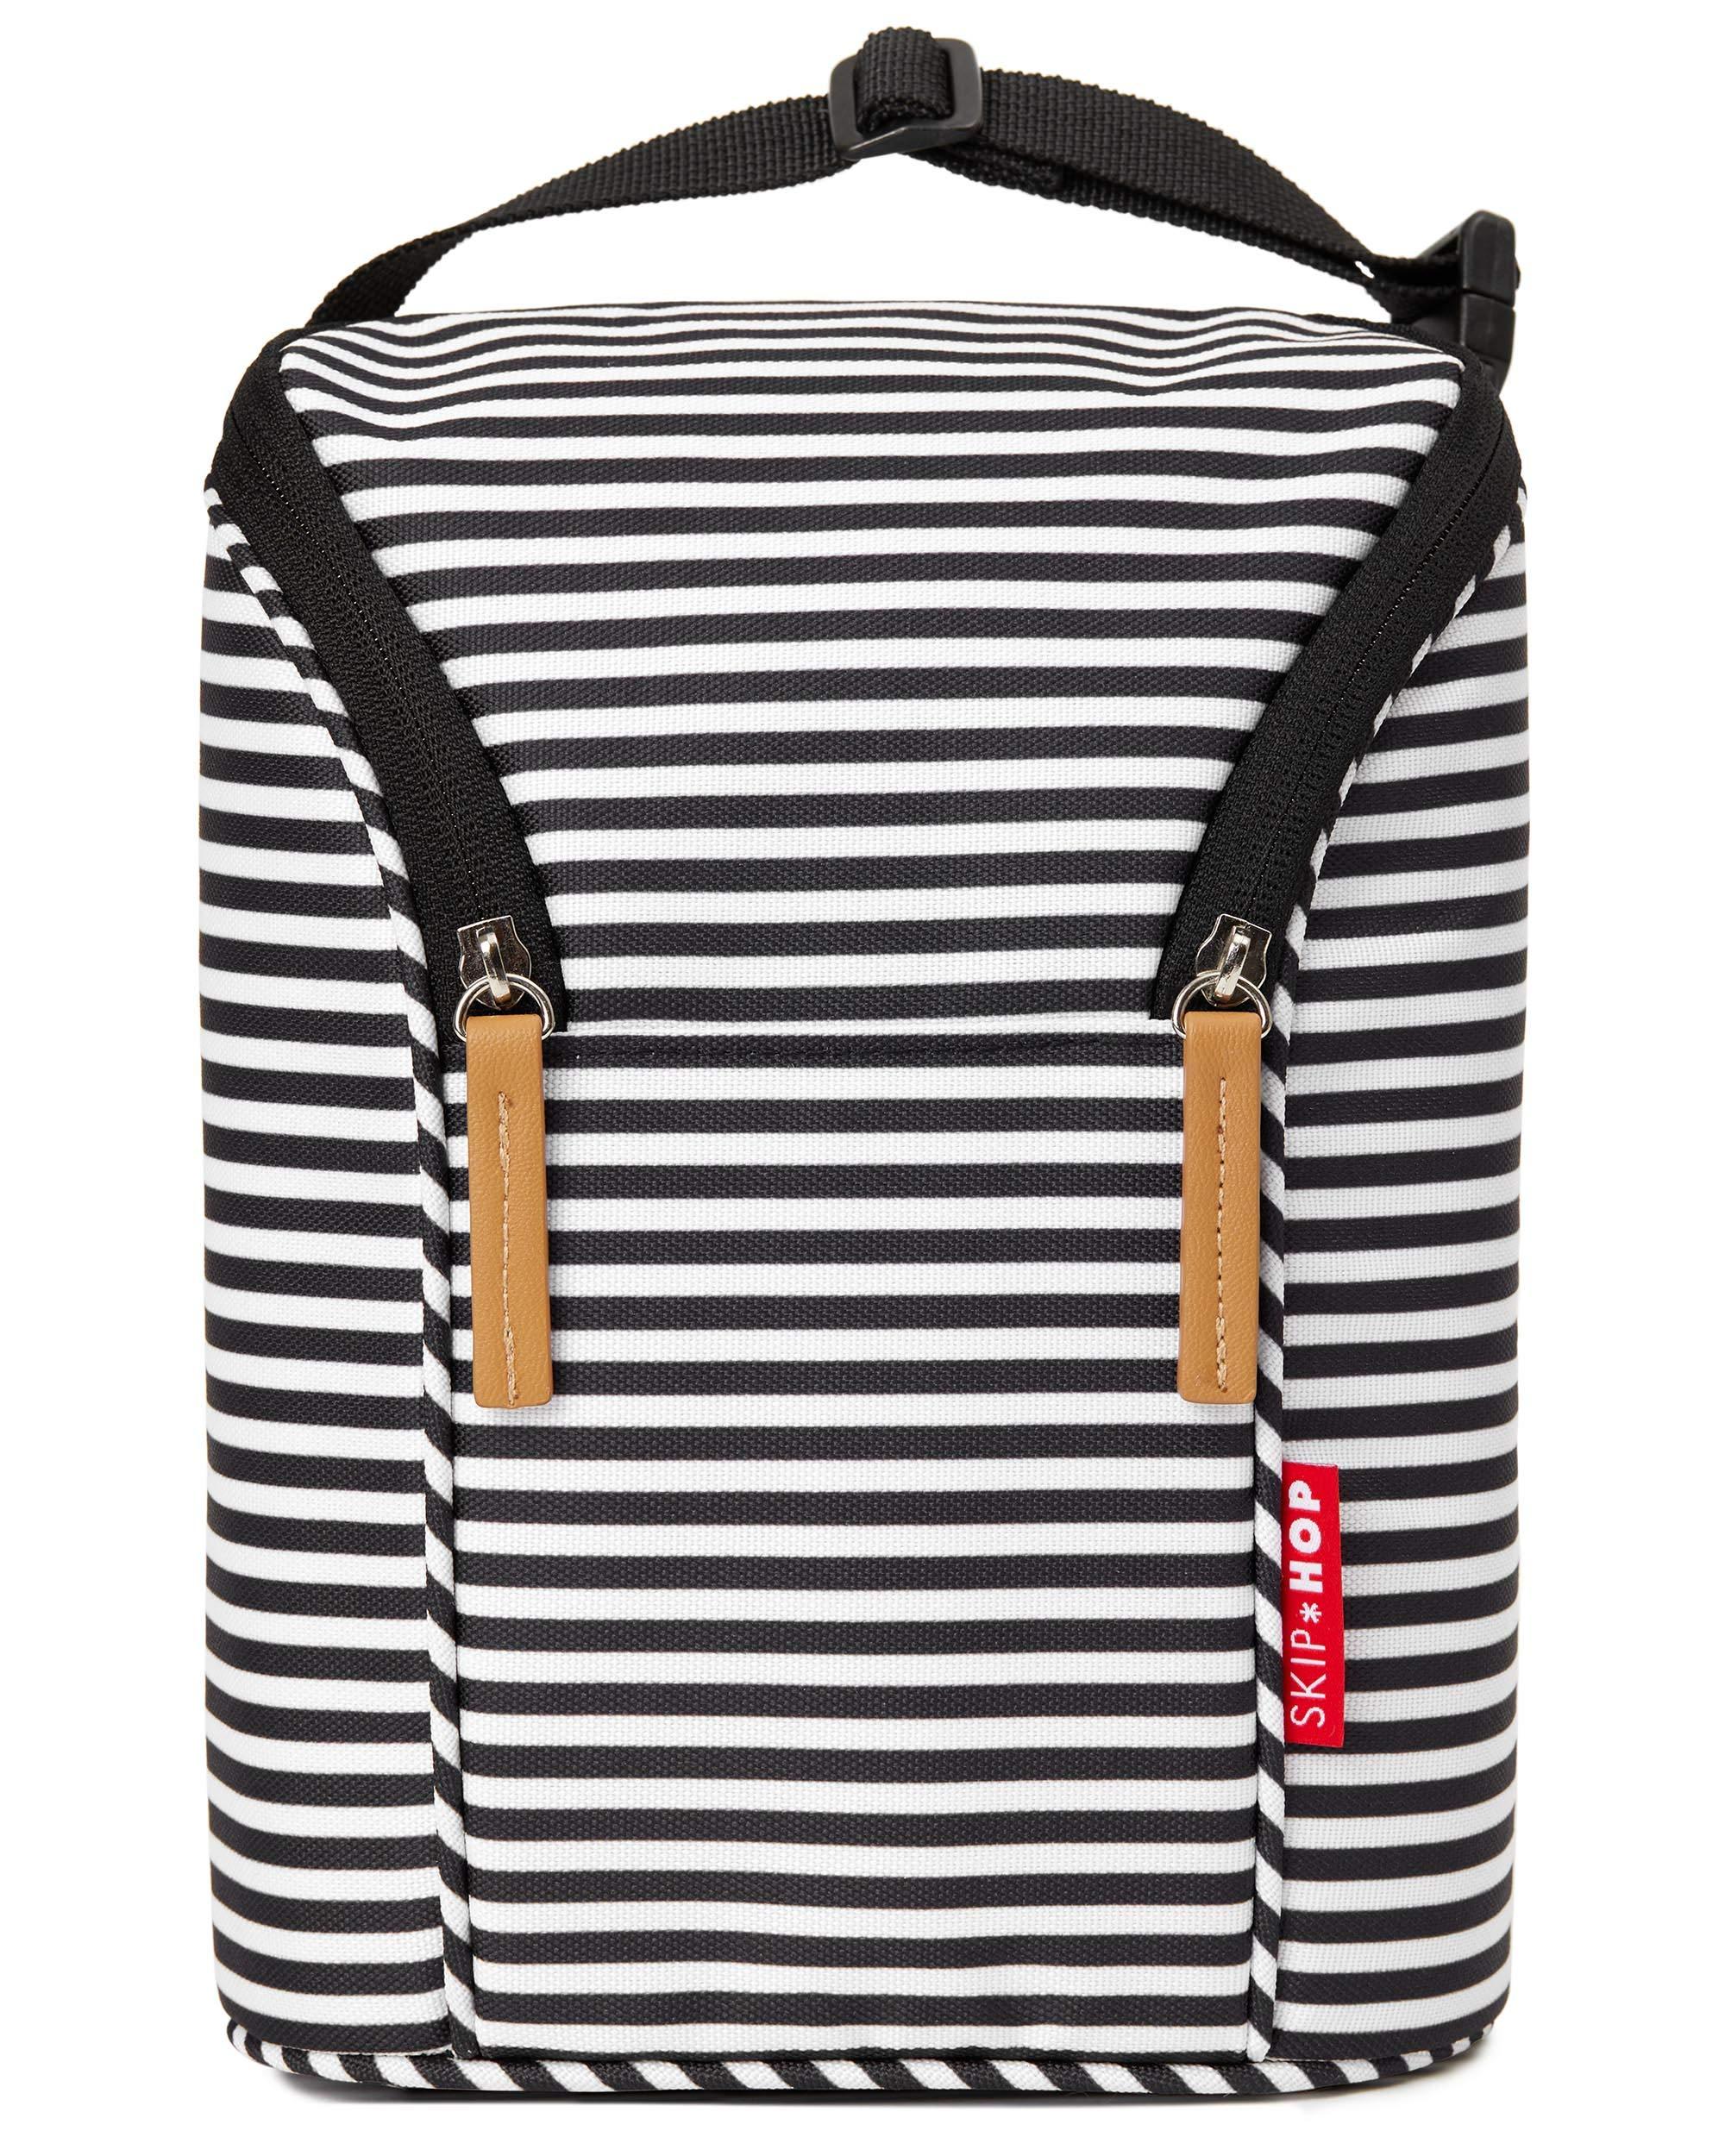 Skip Hop Insulated Breastmilk Cooler And Double Baby Bottle Bag, Black & White Stripe